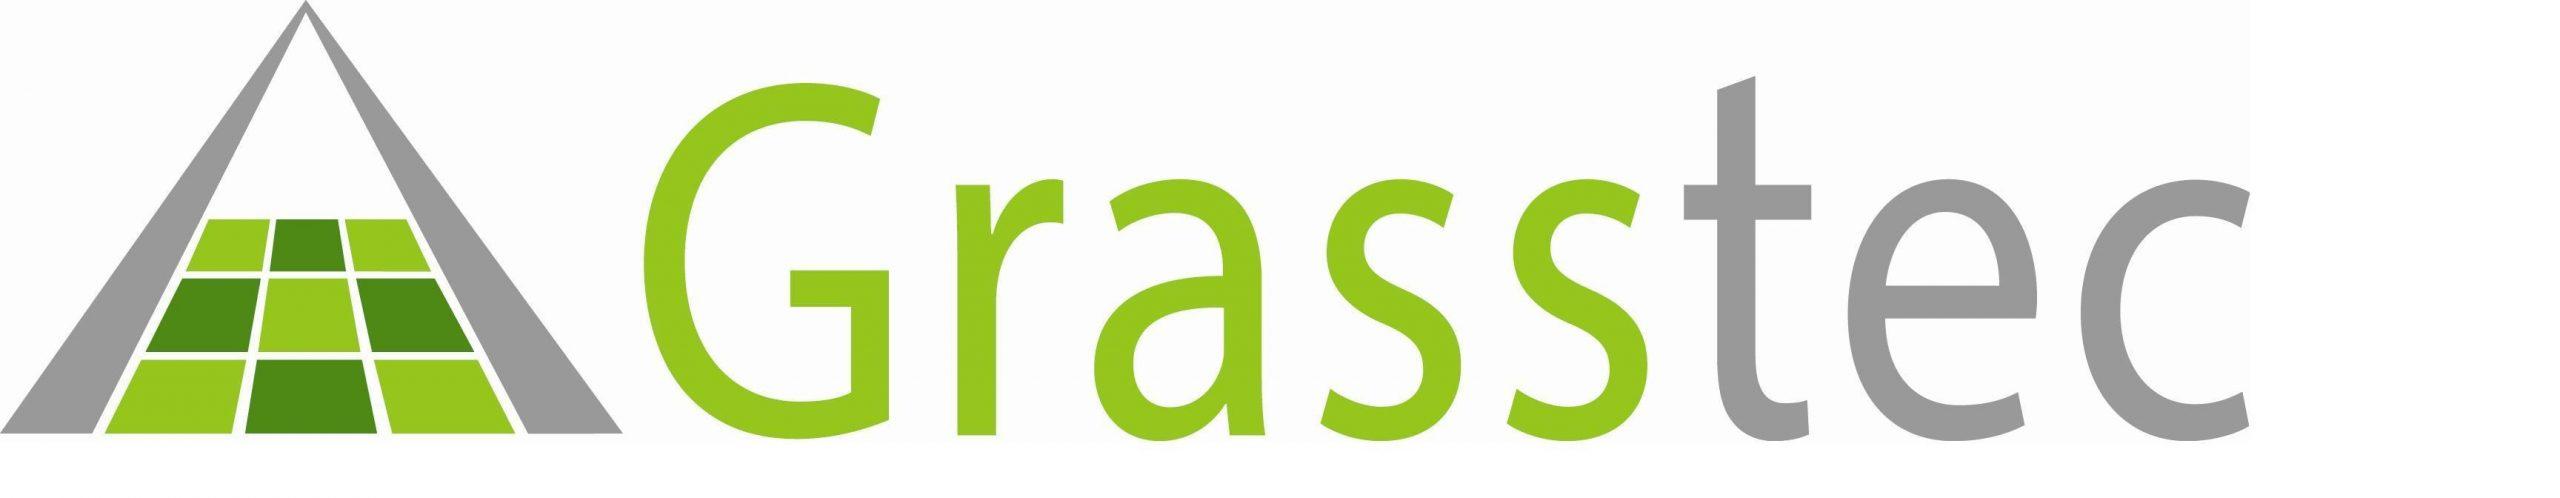 Industry Partners | VistaMilk